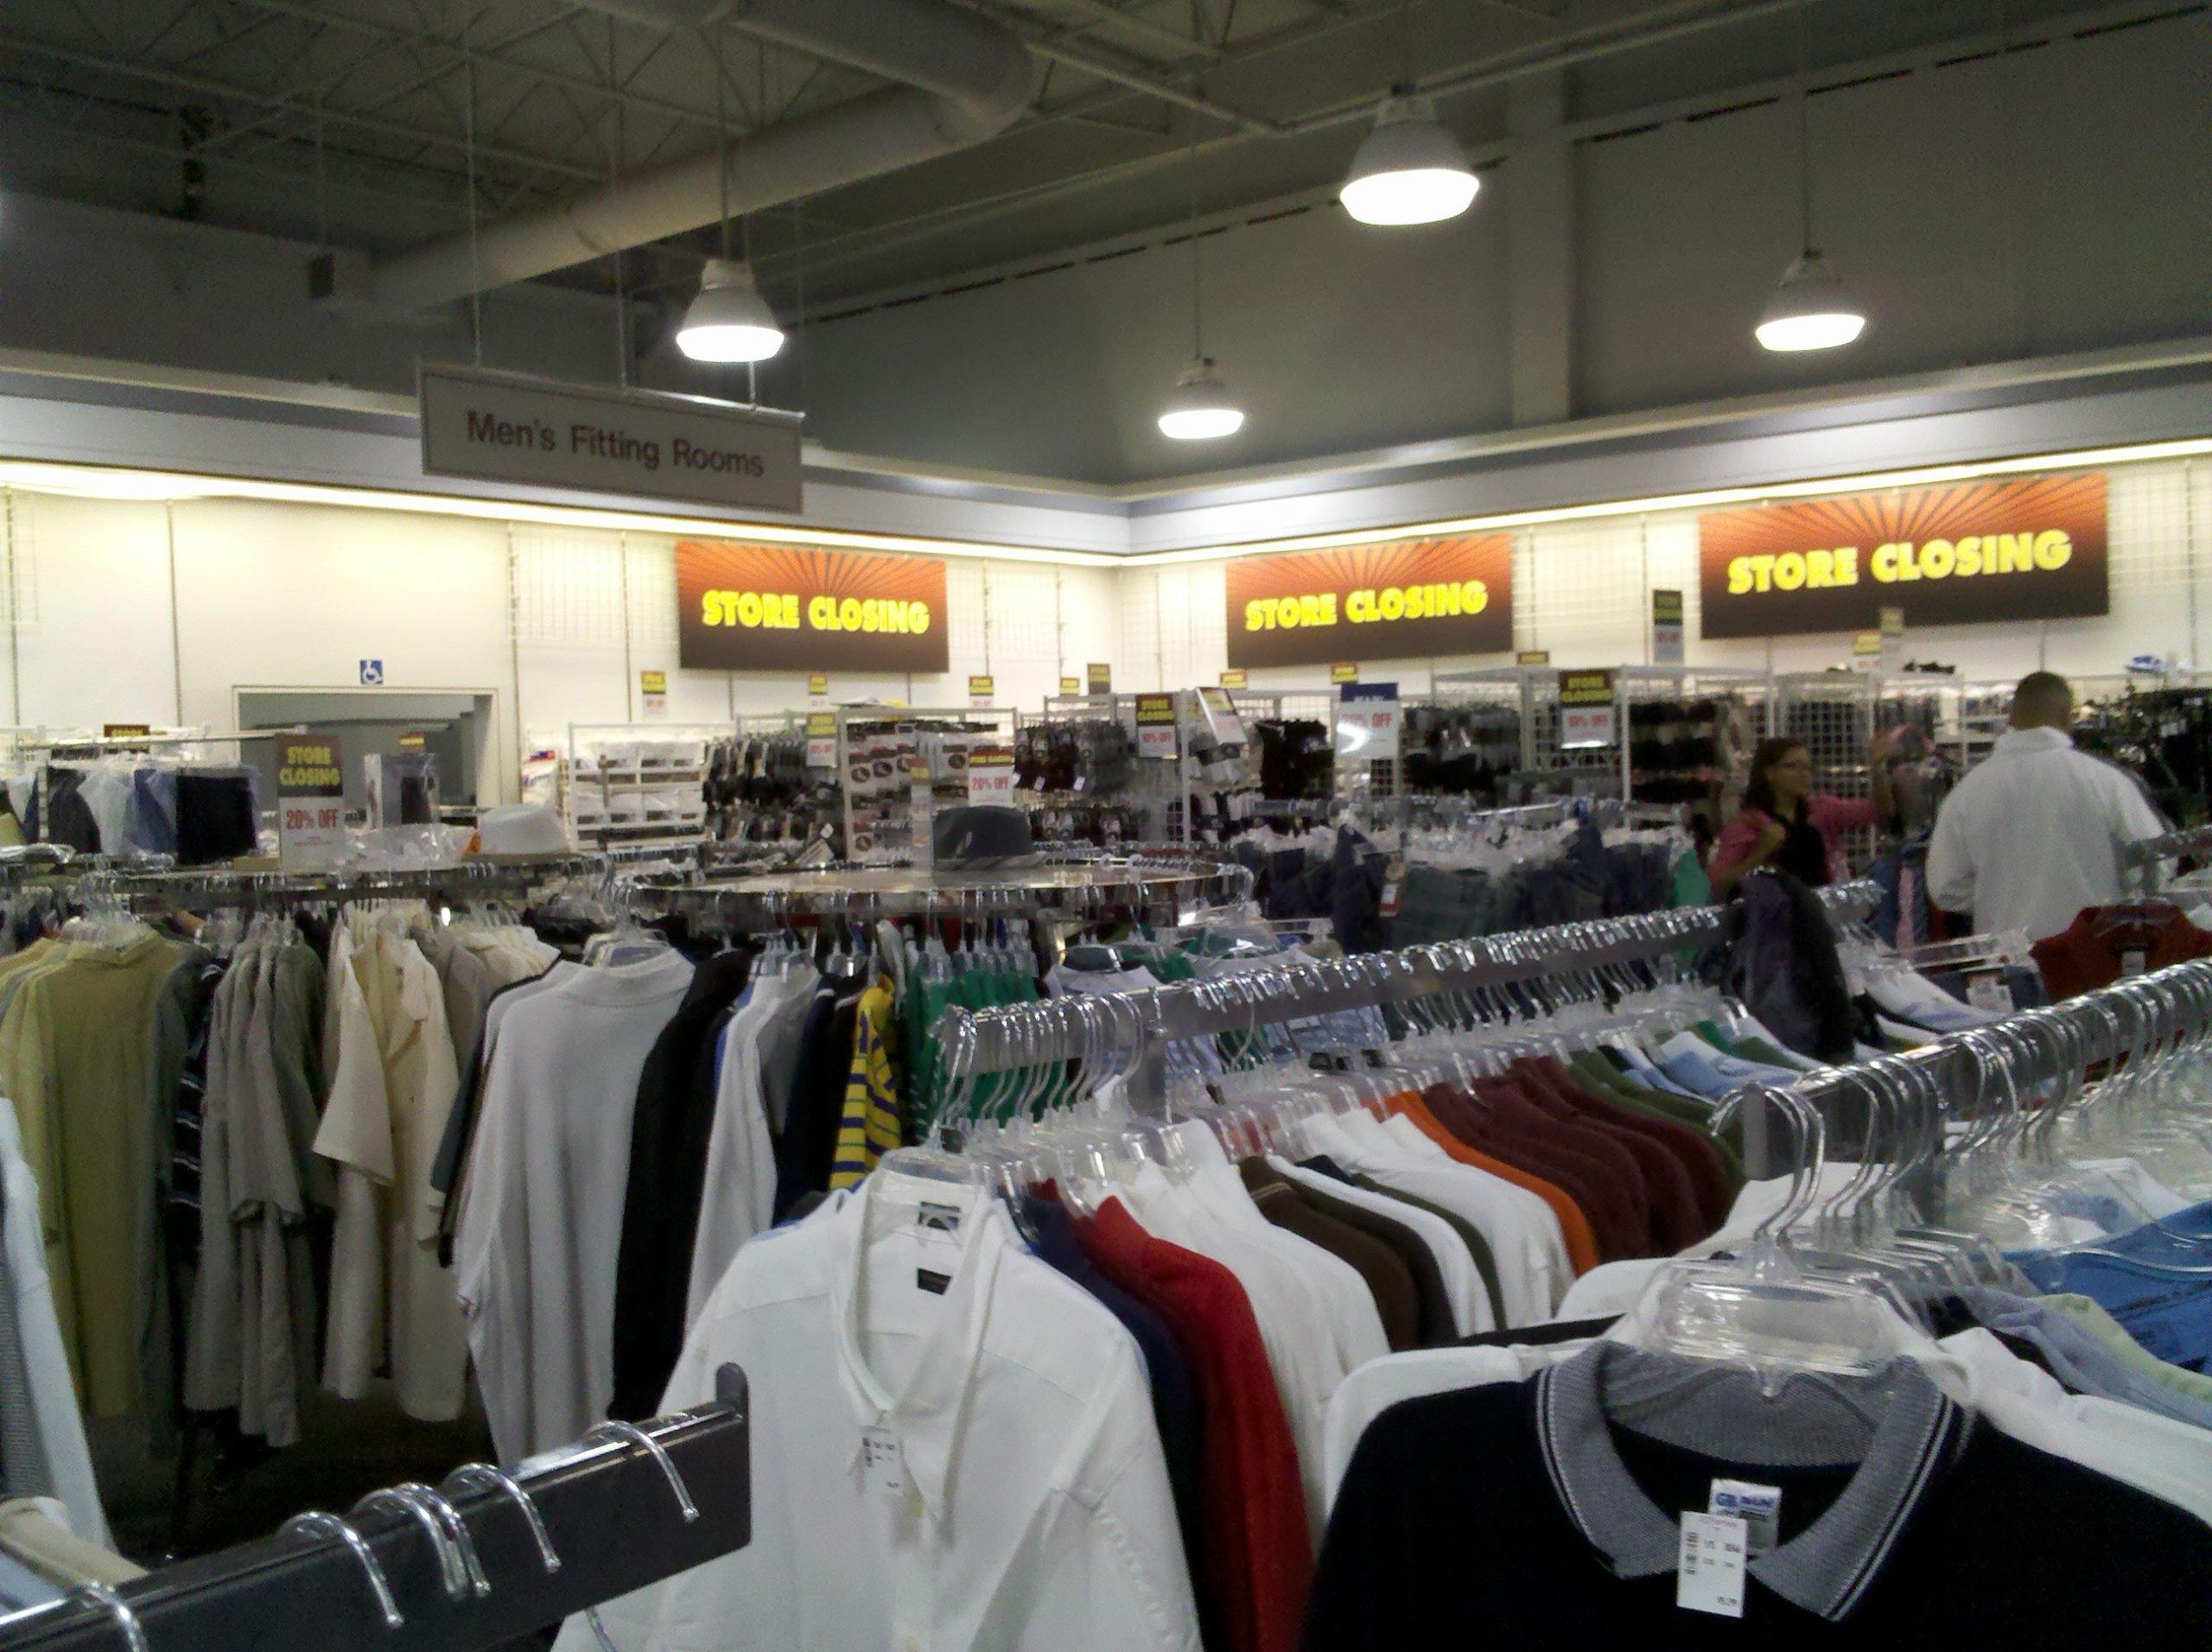 Liquidation Sales At Jc Penney Stores Start This Week